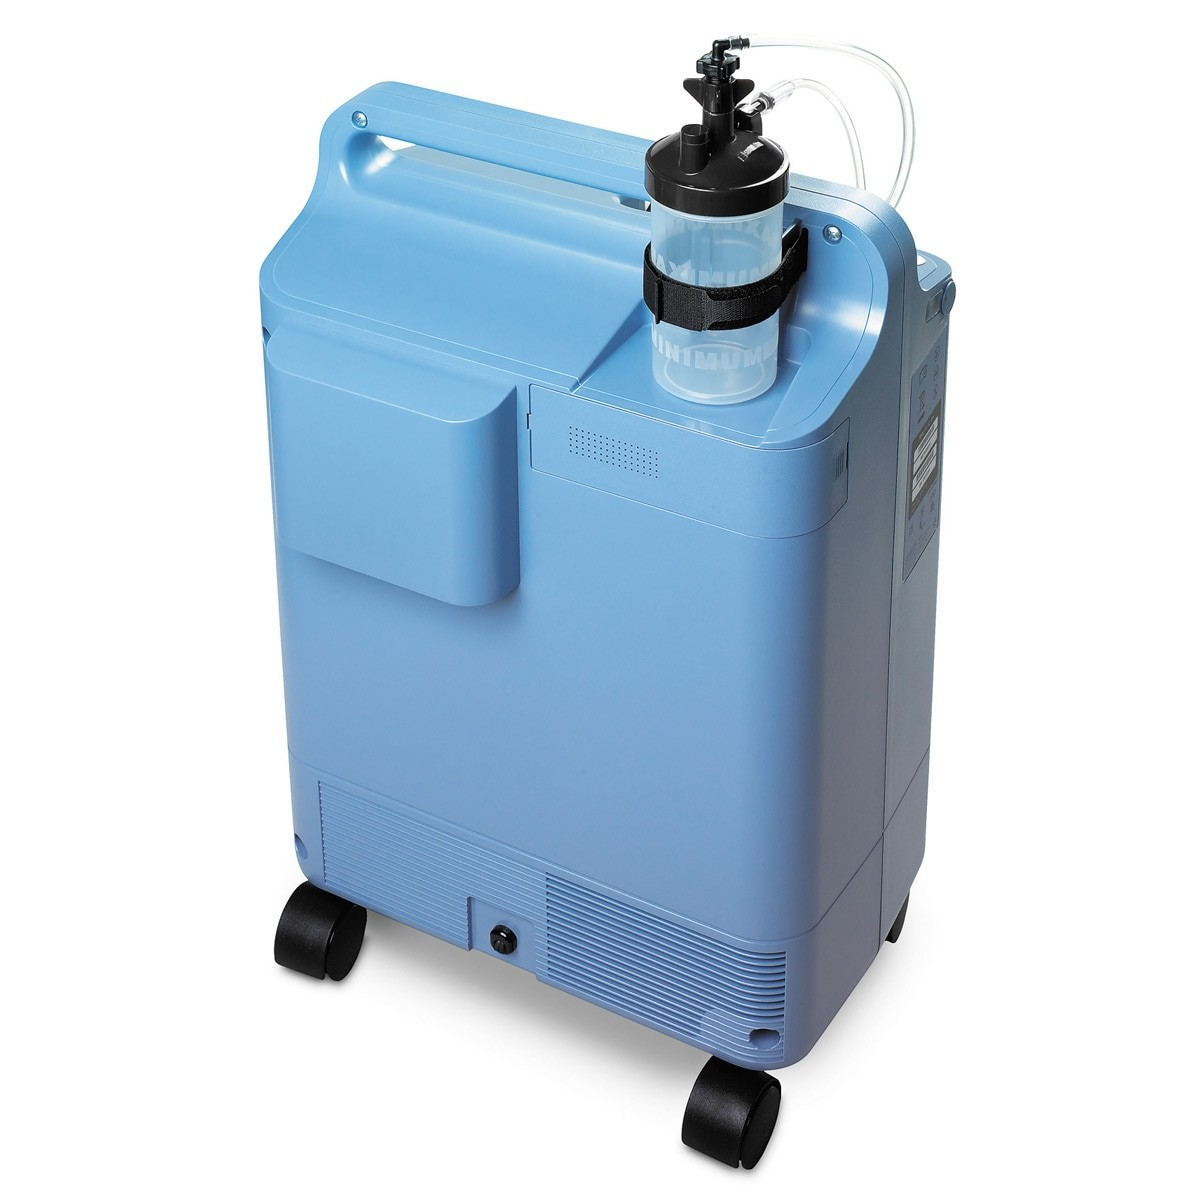 Blue Respironics Everflo Stationary Oxygen Concentrator